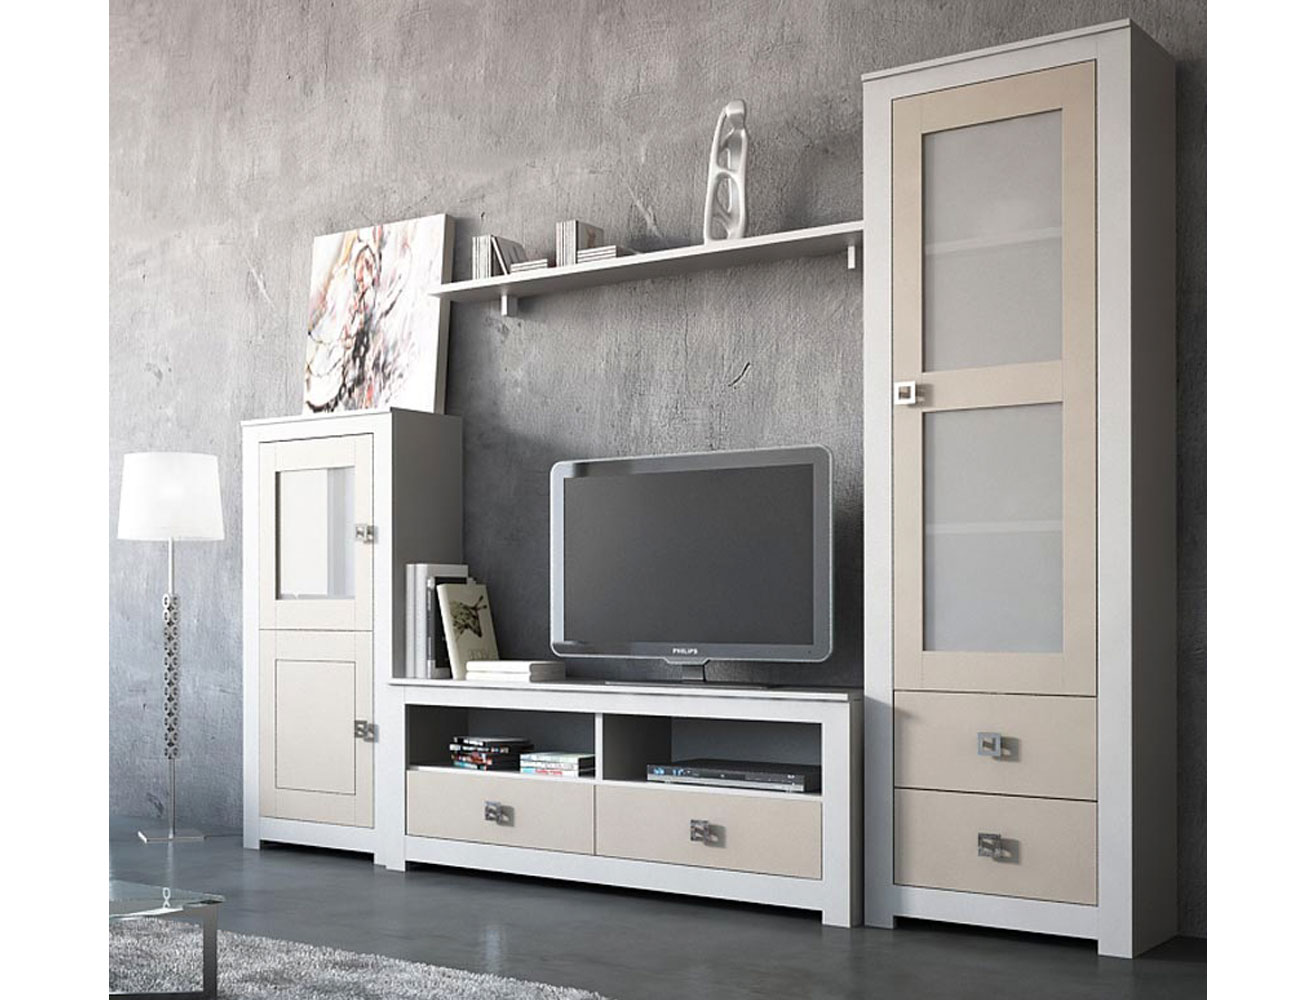 Muebles salon utrera for Muebles de cocina zarate